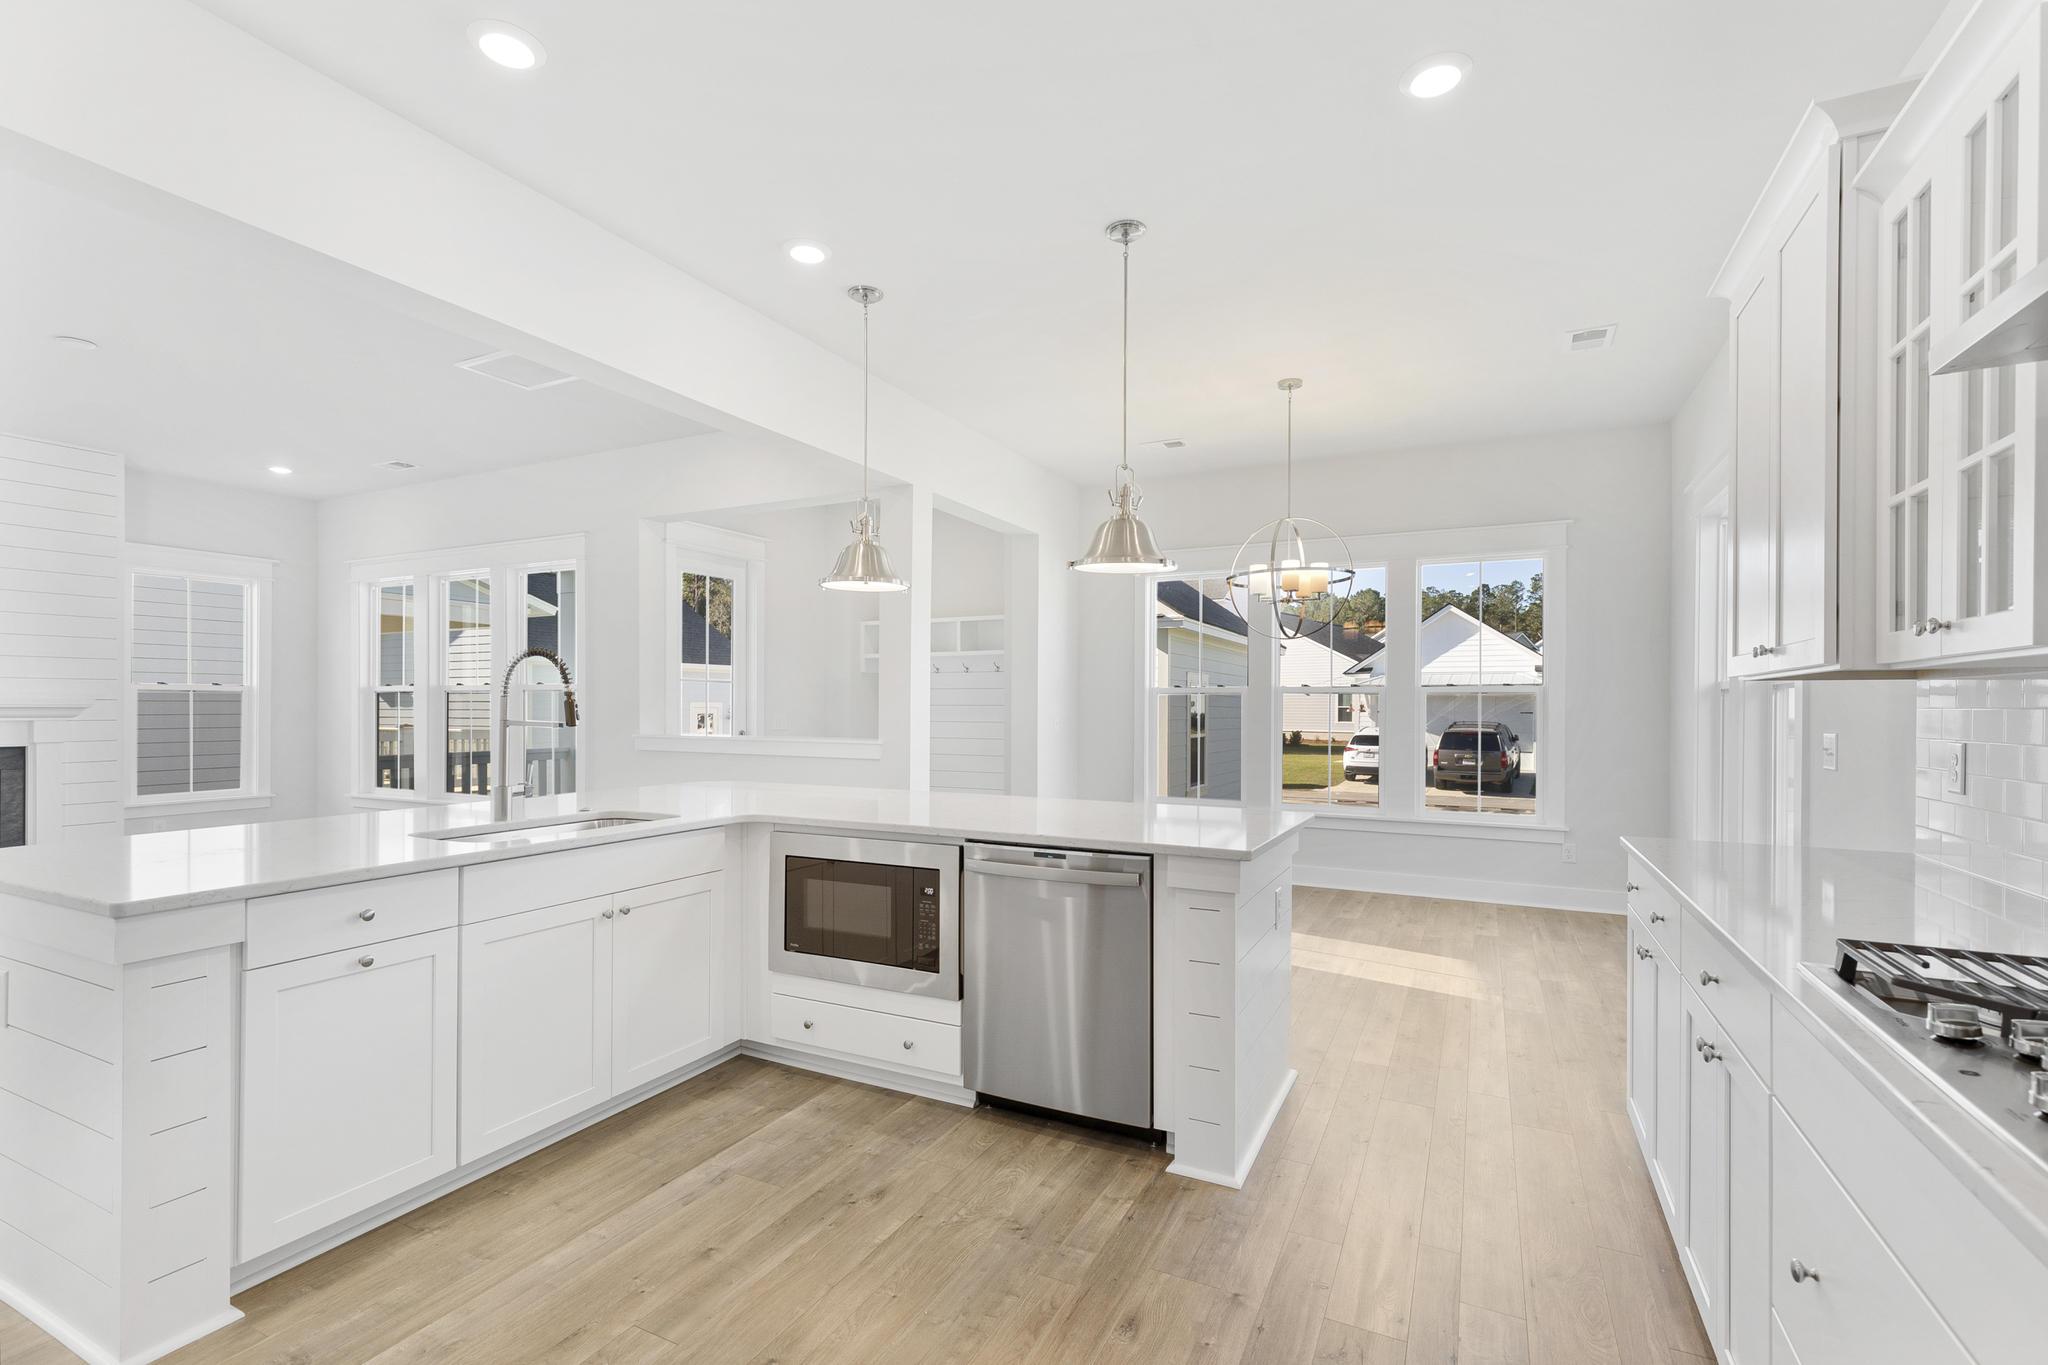 Carolina Park Homes For Sale - 1766 Sandy Brook, Mount Pleasant, SC - 7